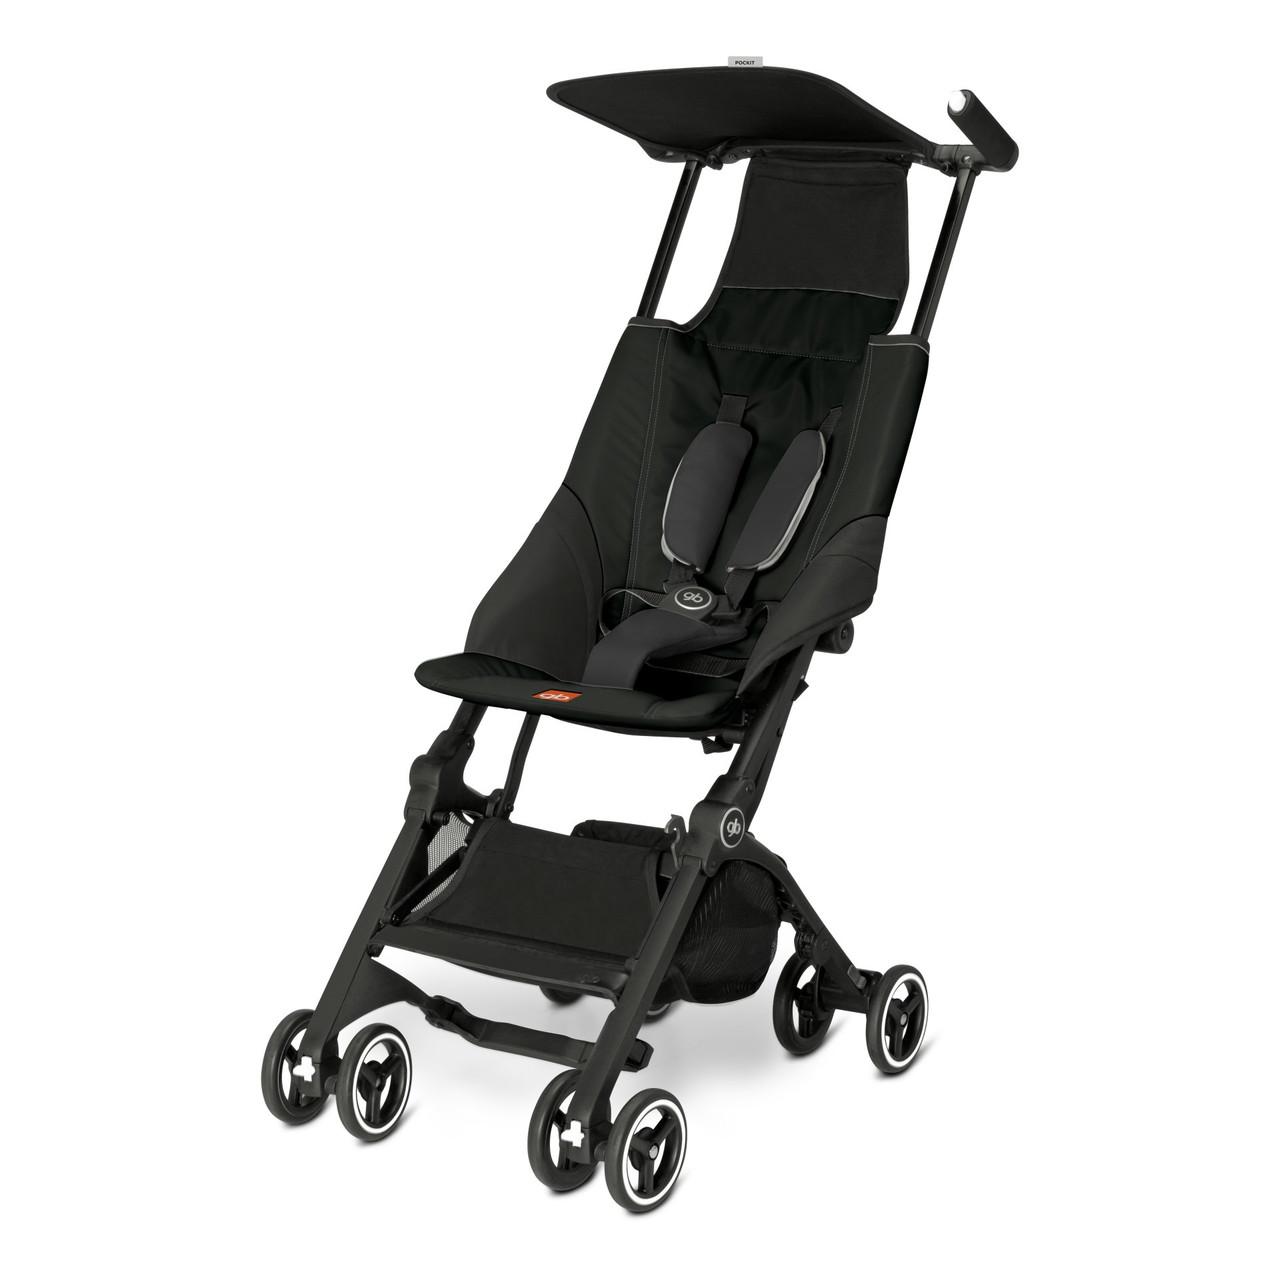 Прогулочная коляска «gb» Pockit, цвет Monument Black (чёрный) (616230001) «gb» (616230001)